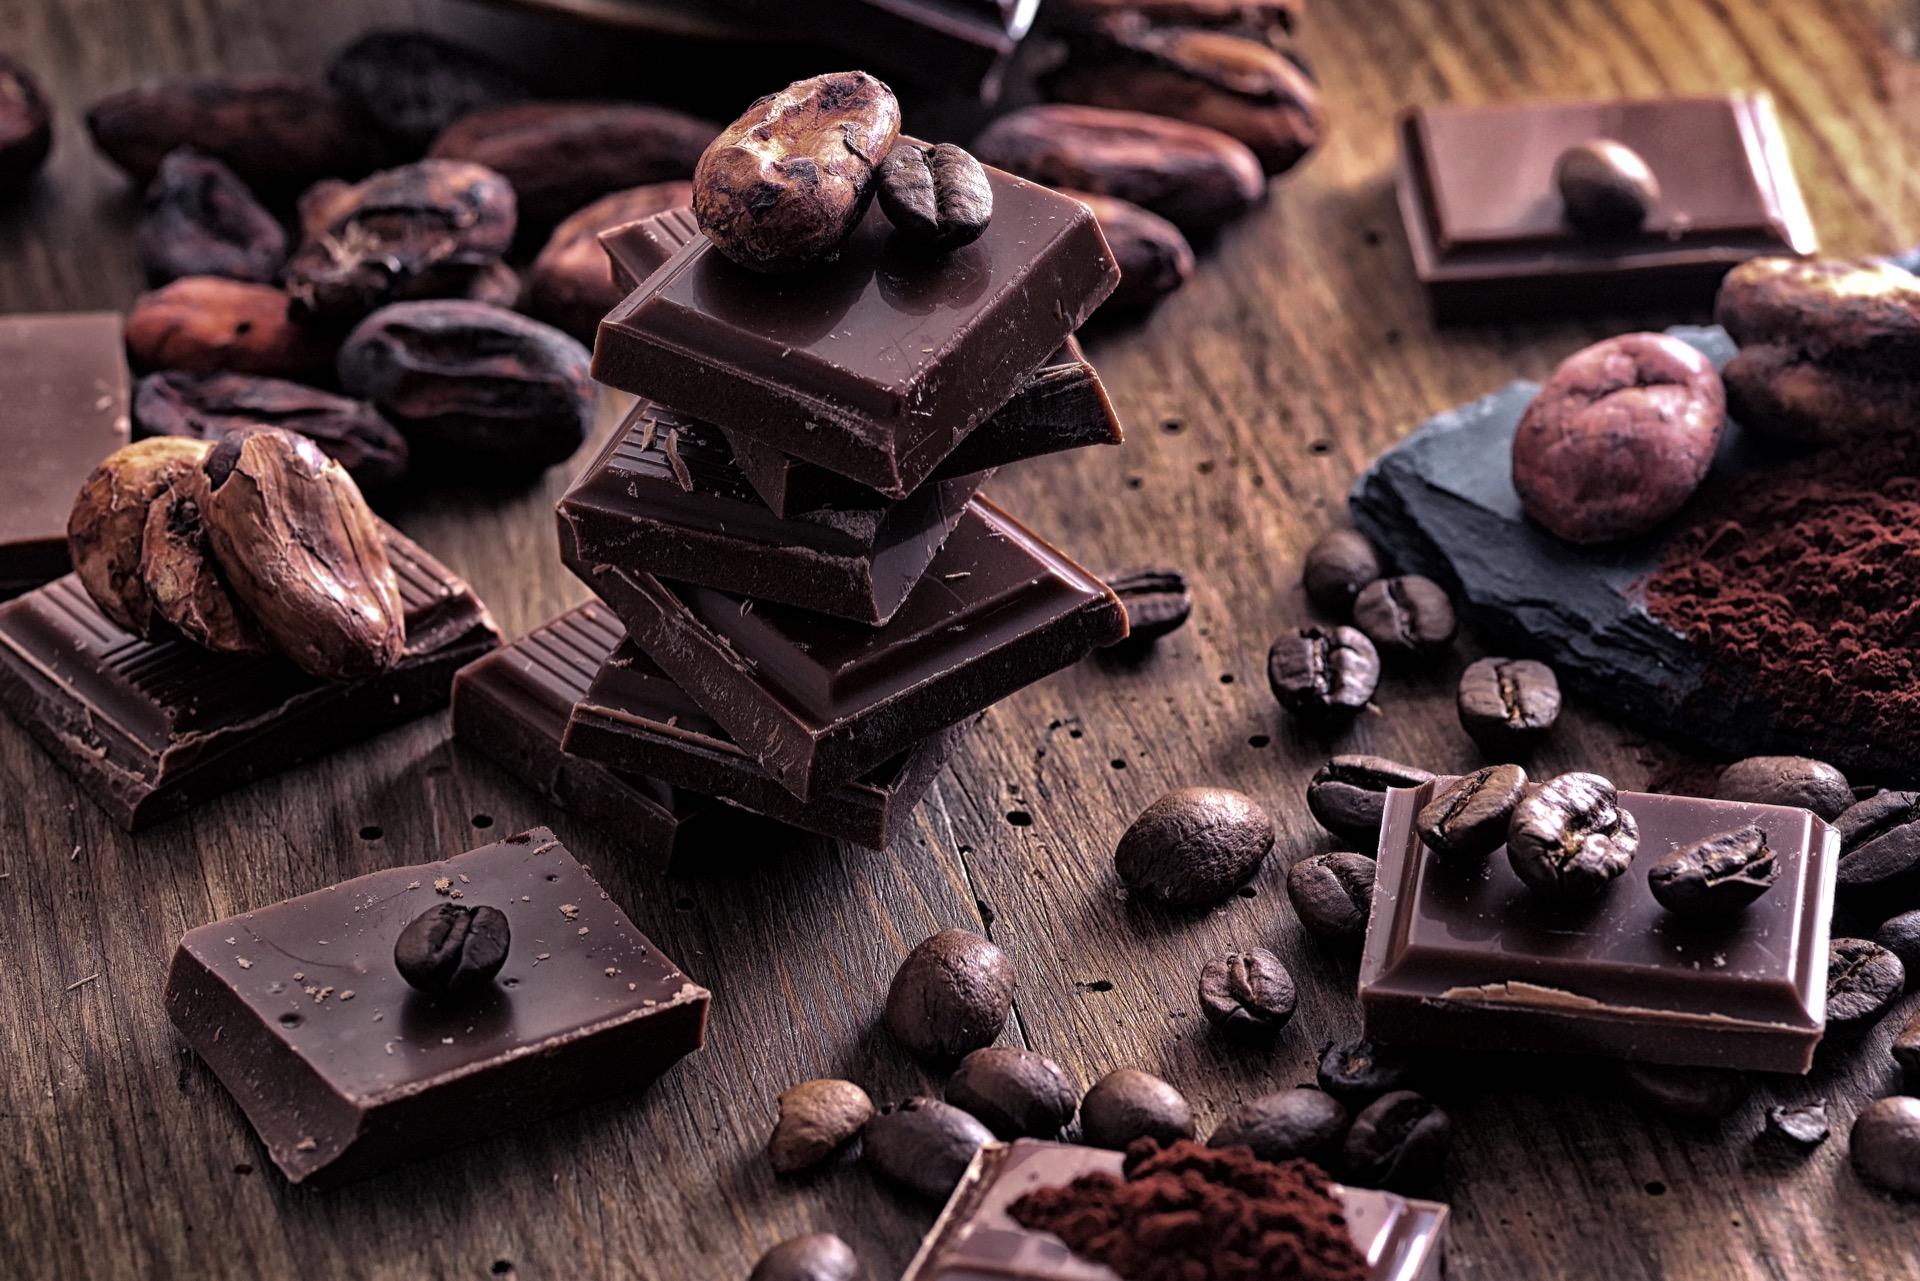 mørk sjokolade sunt